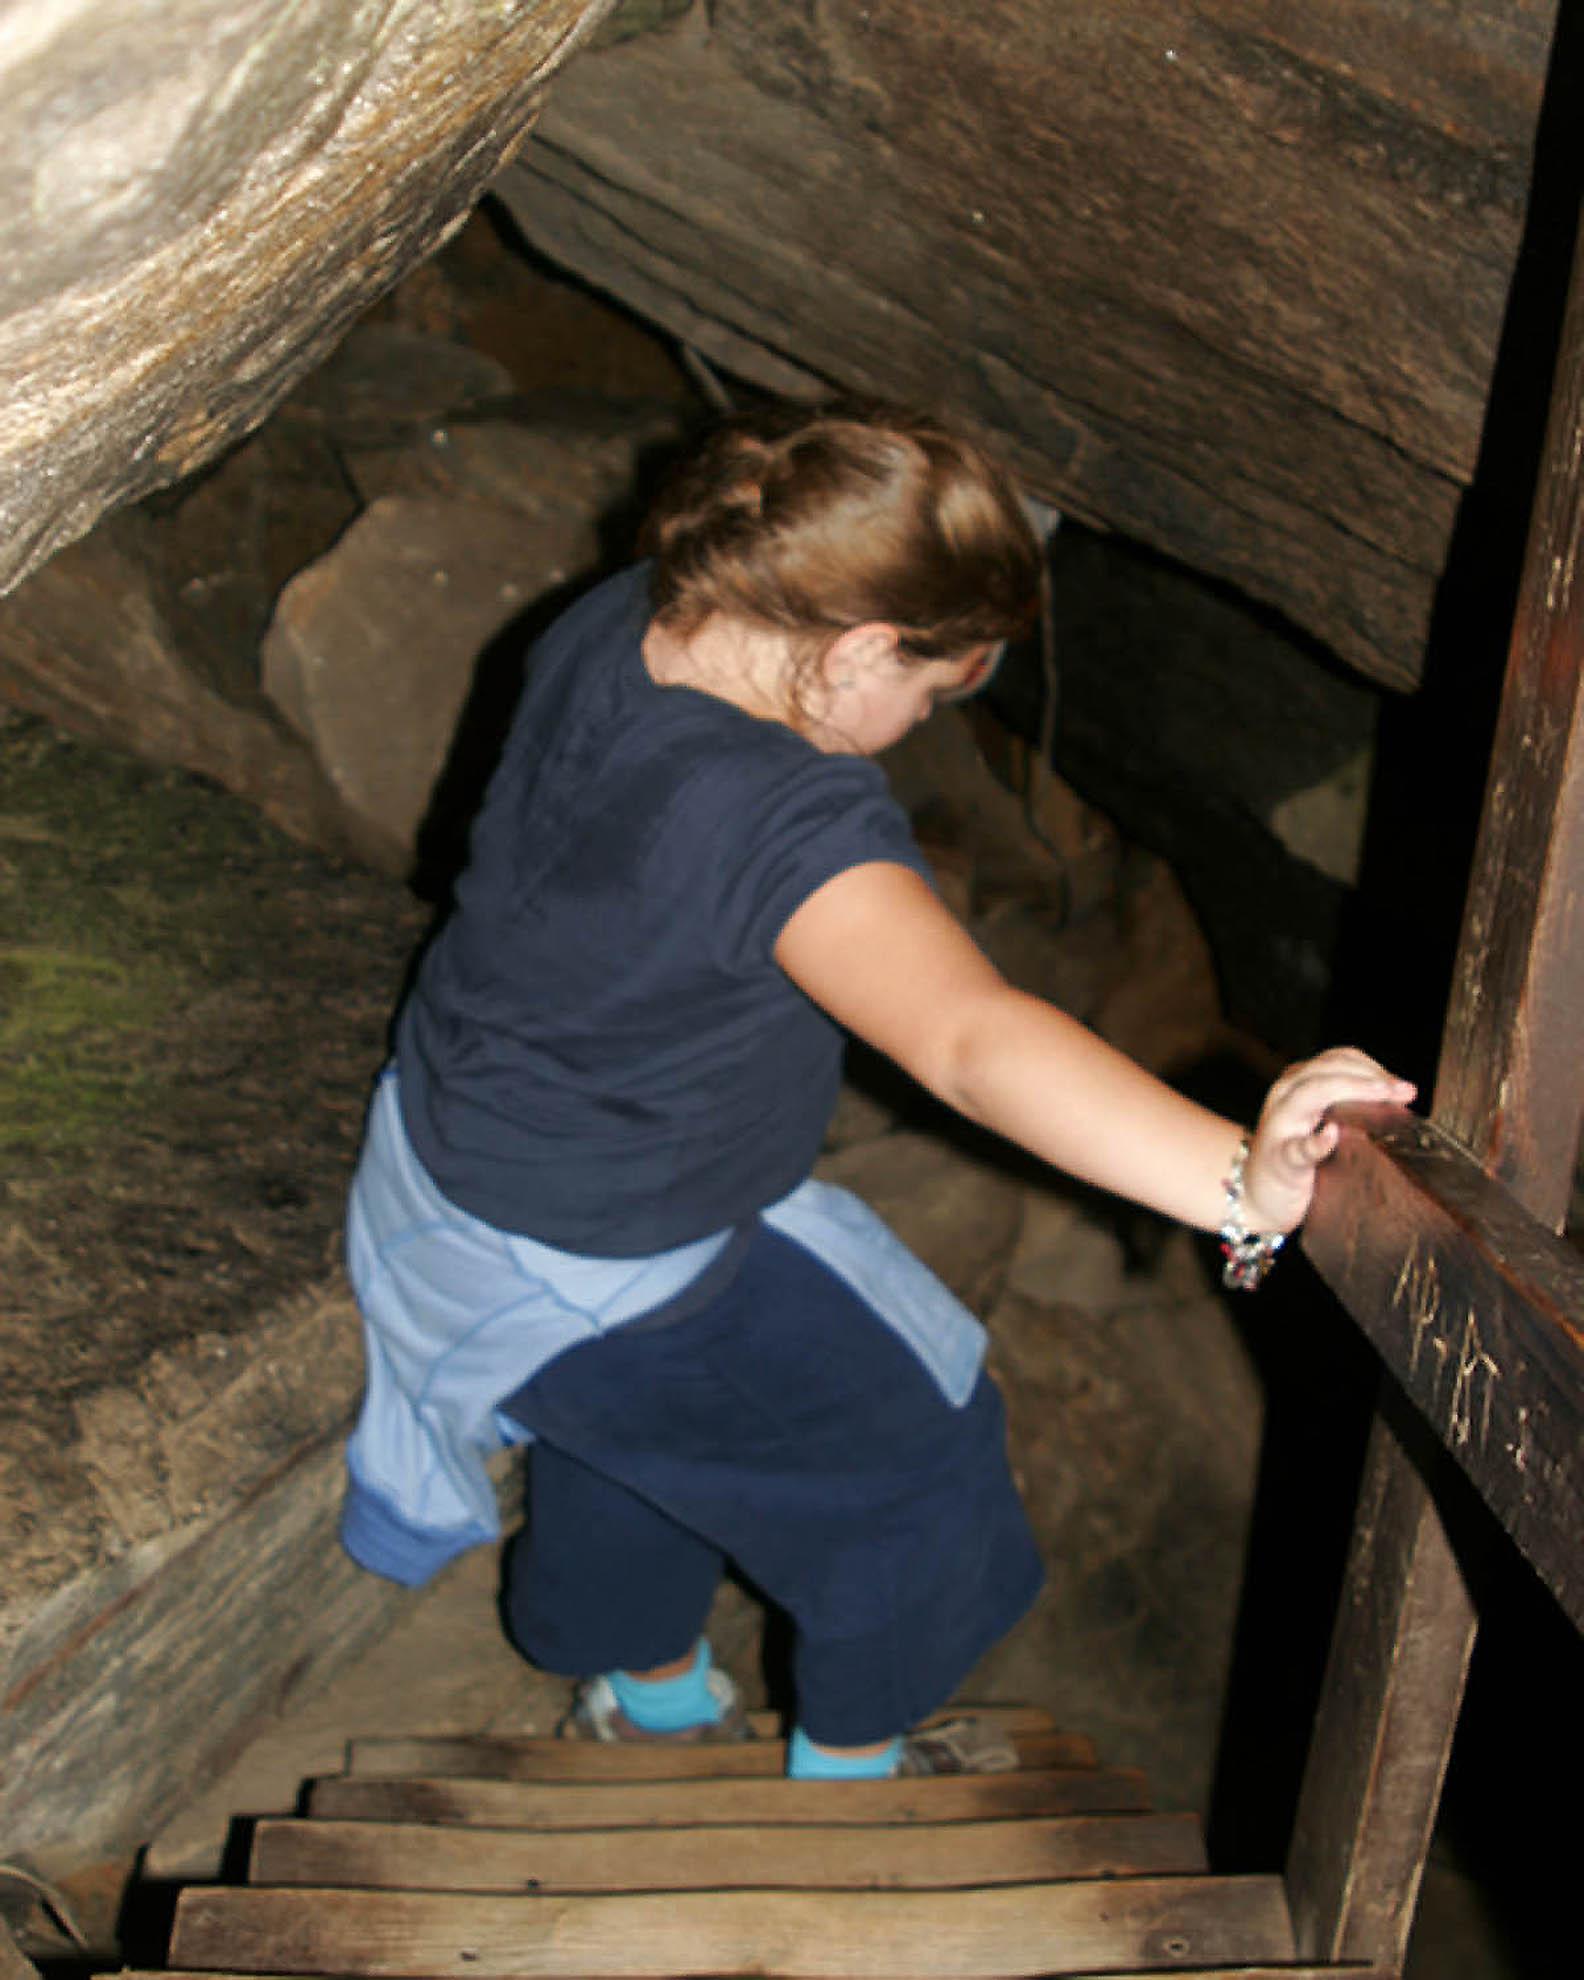 A visitor descends into the Polar Caves